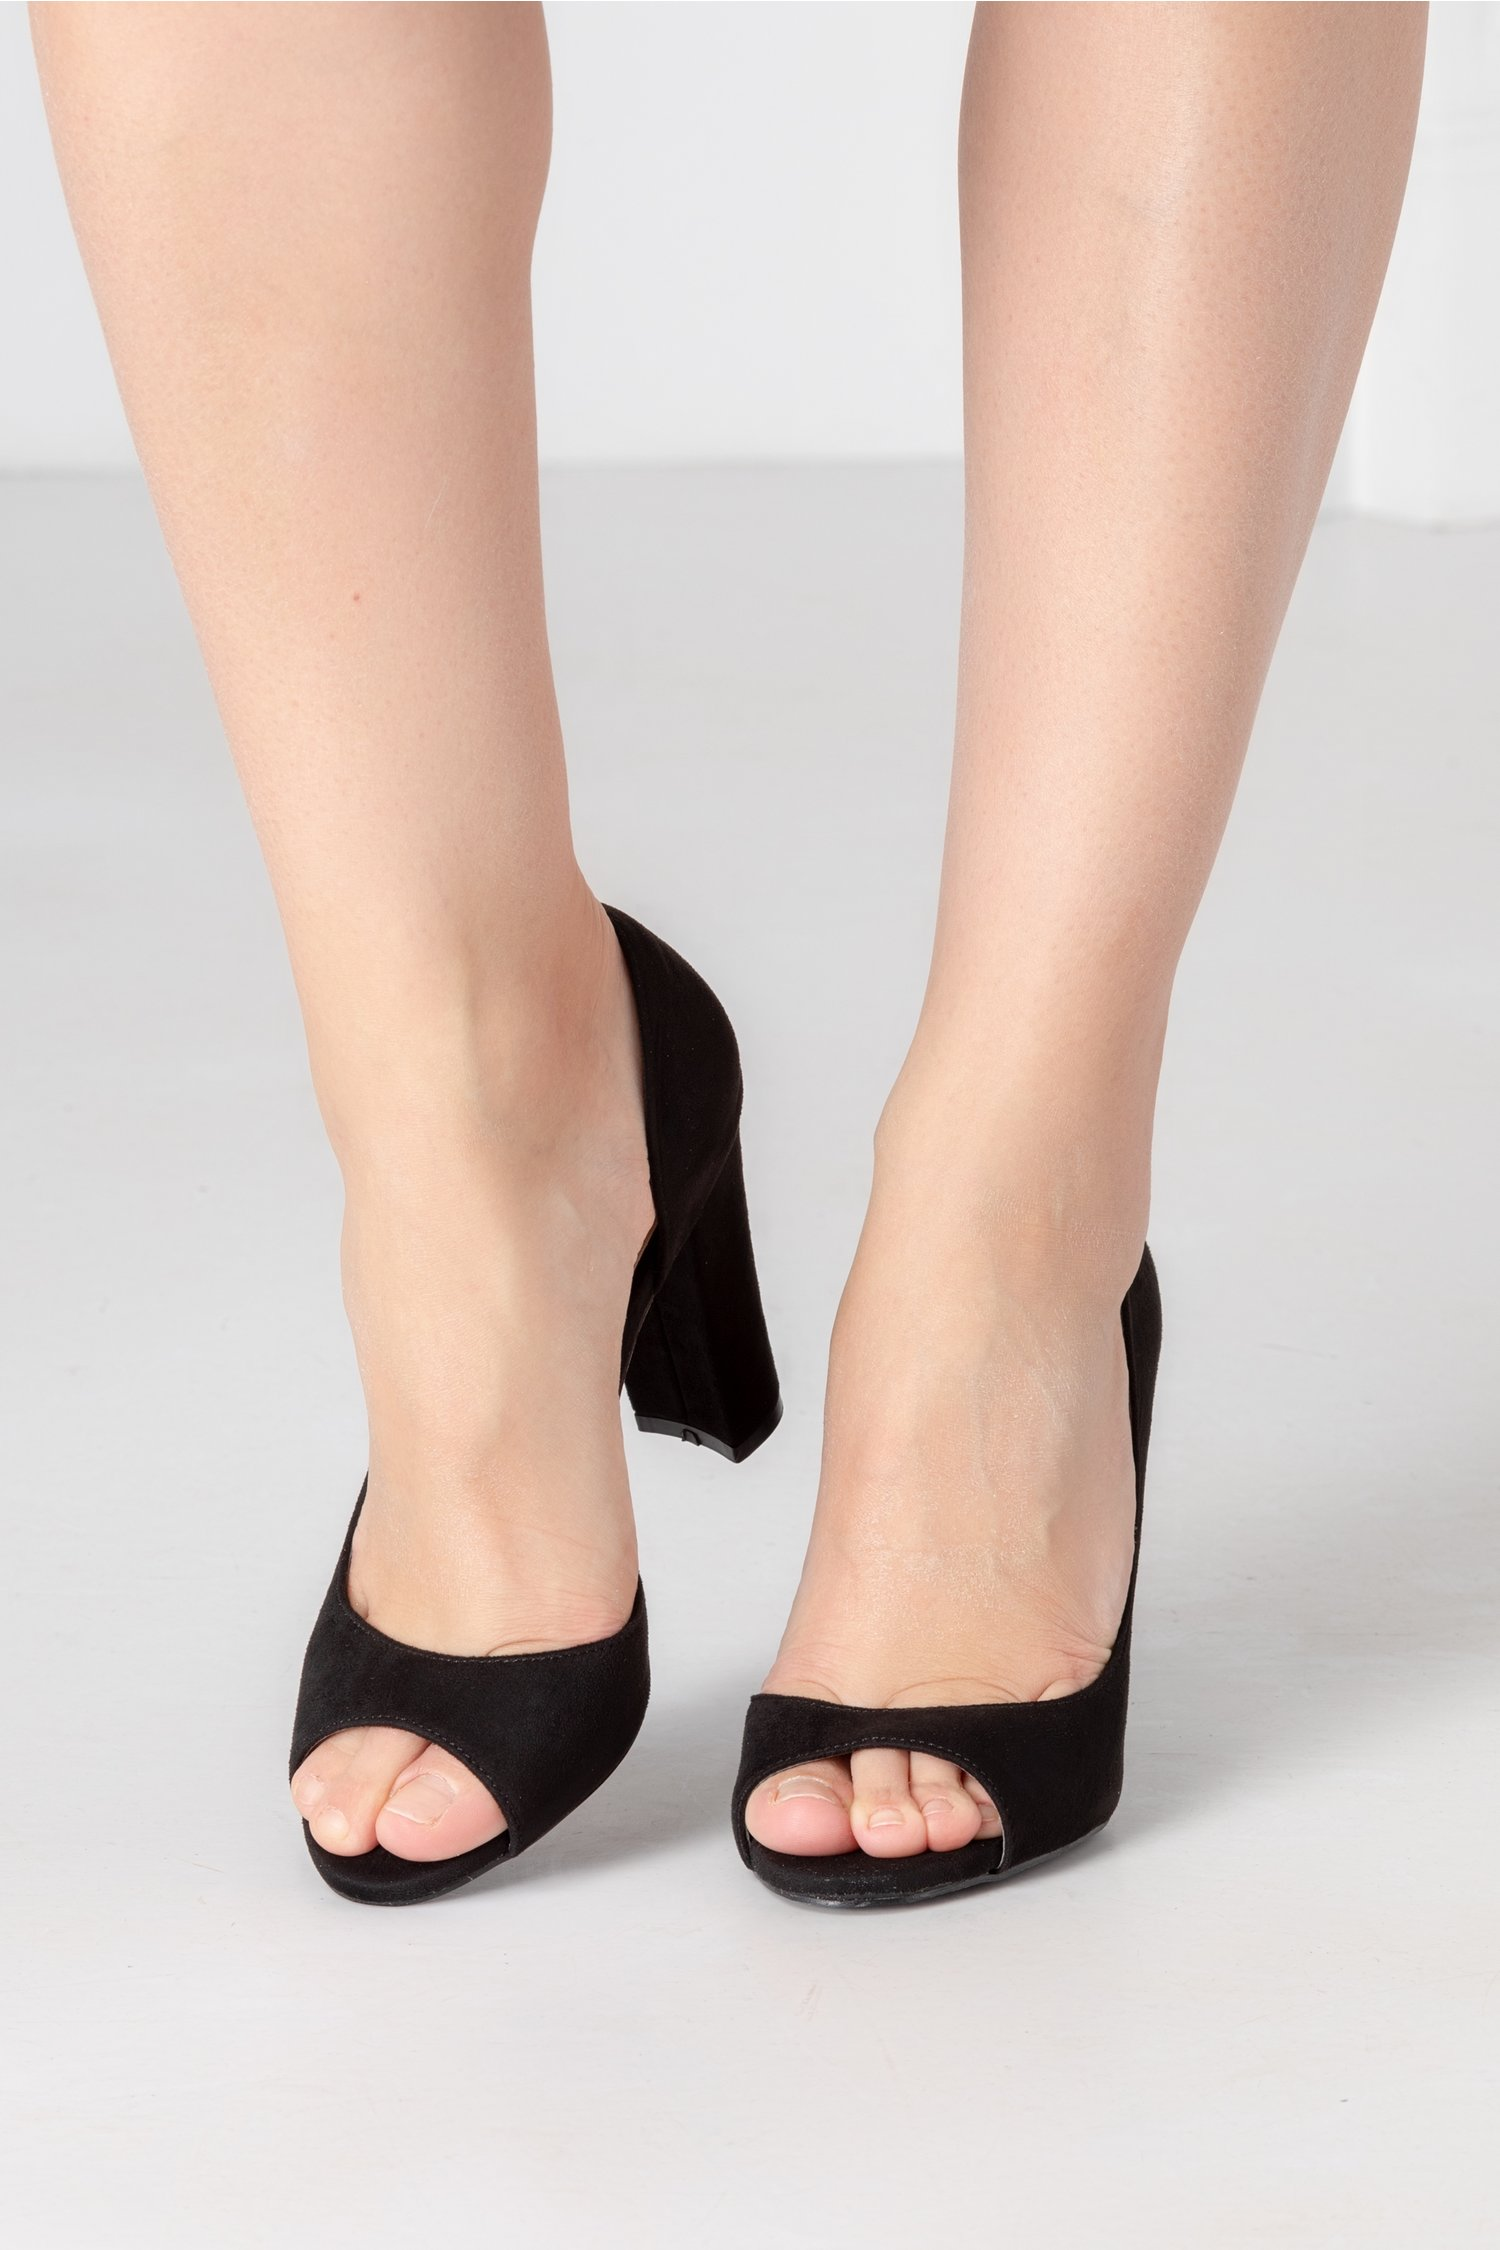 Pantofi dama negri decupati